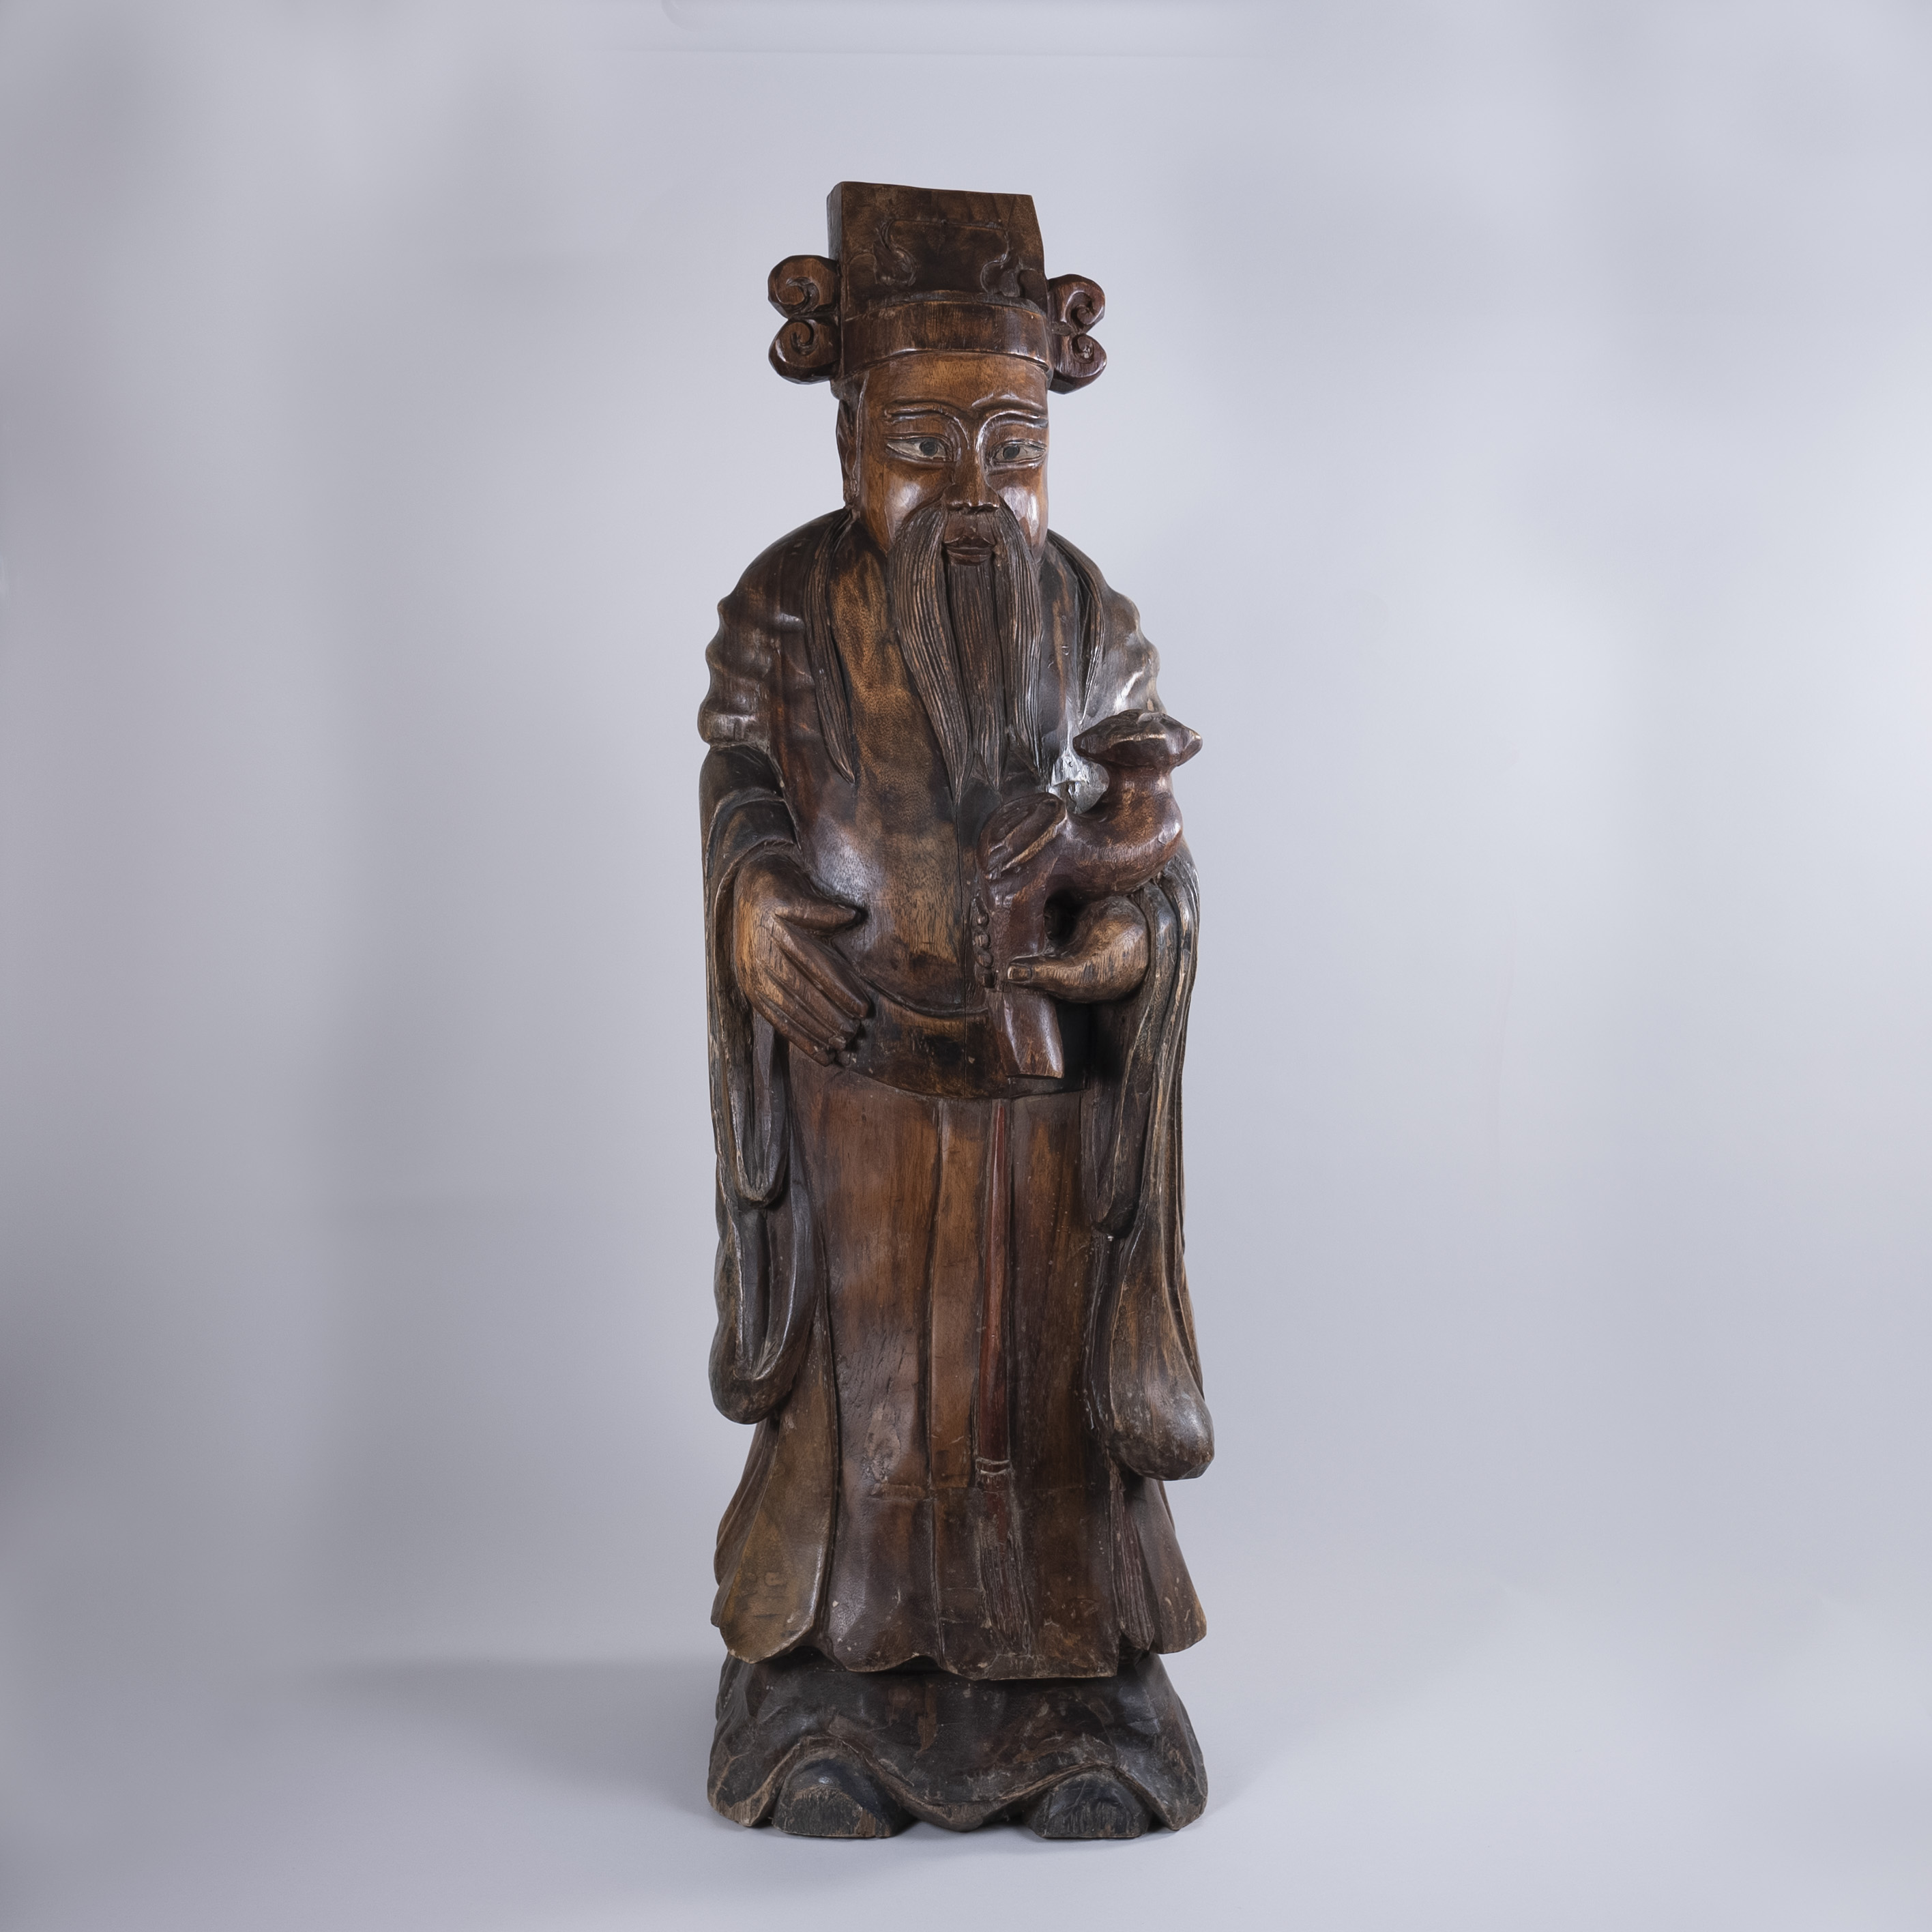 Mid 19th Century Chinese Hardwood Sculpture